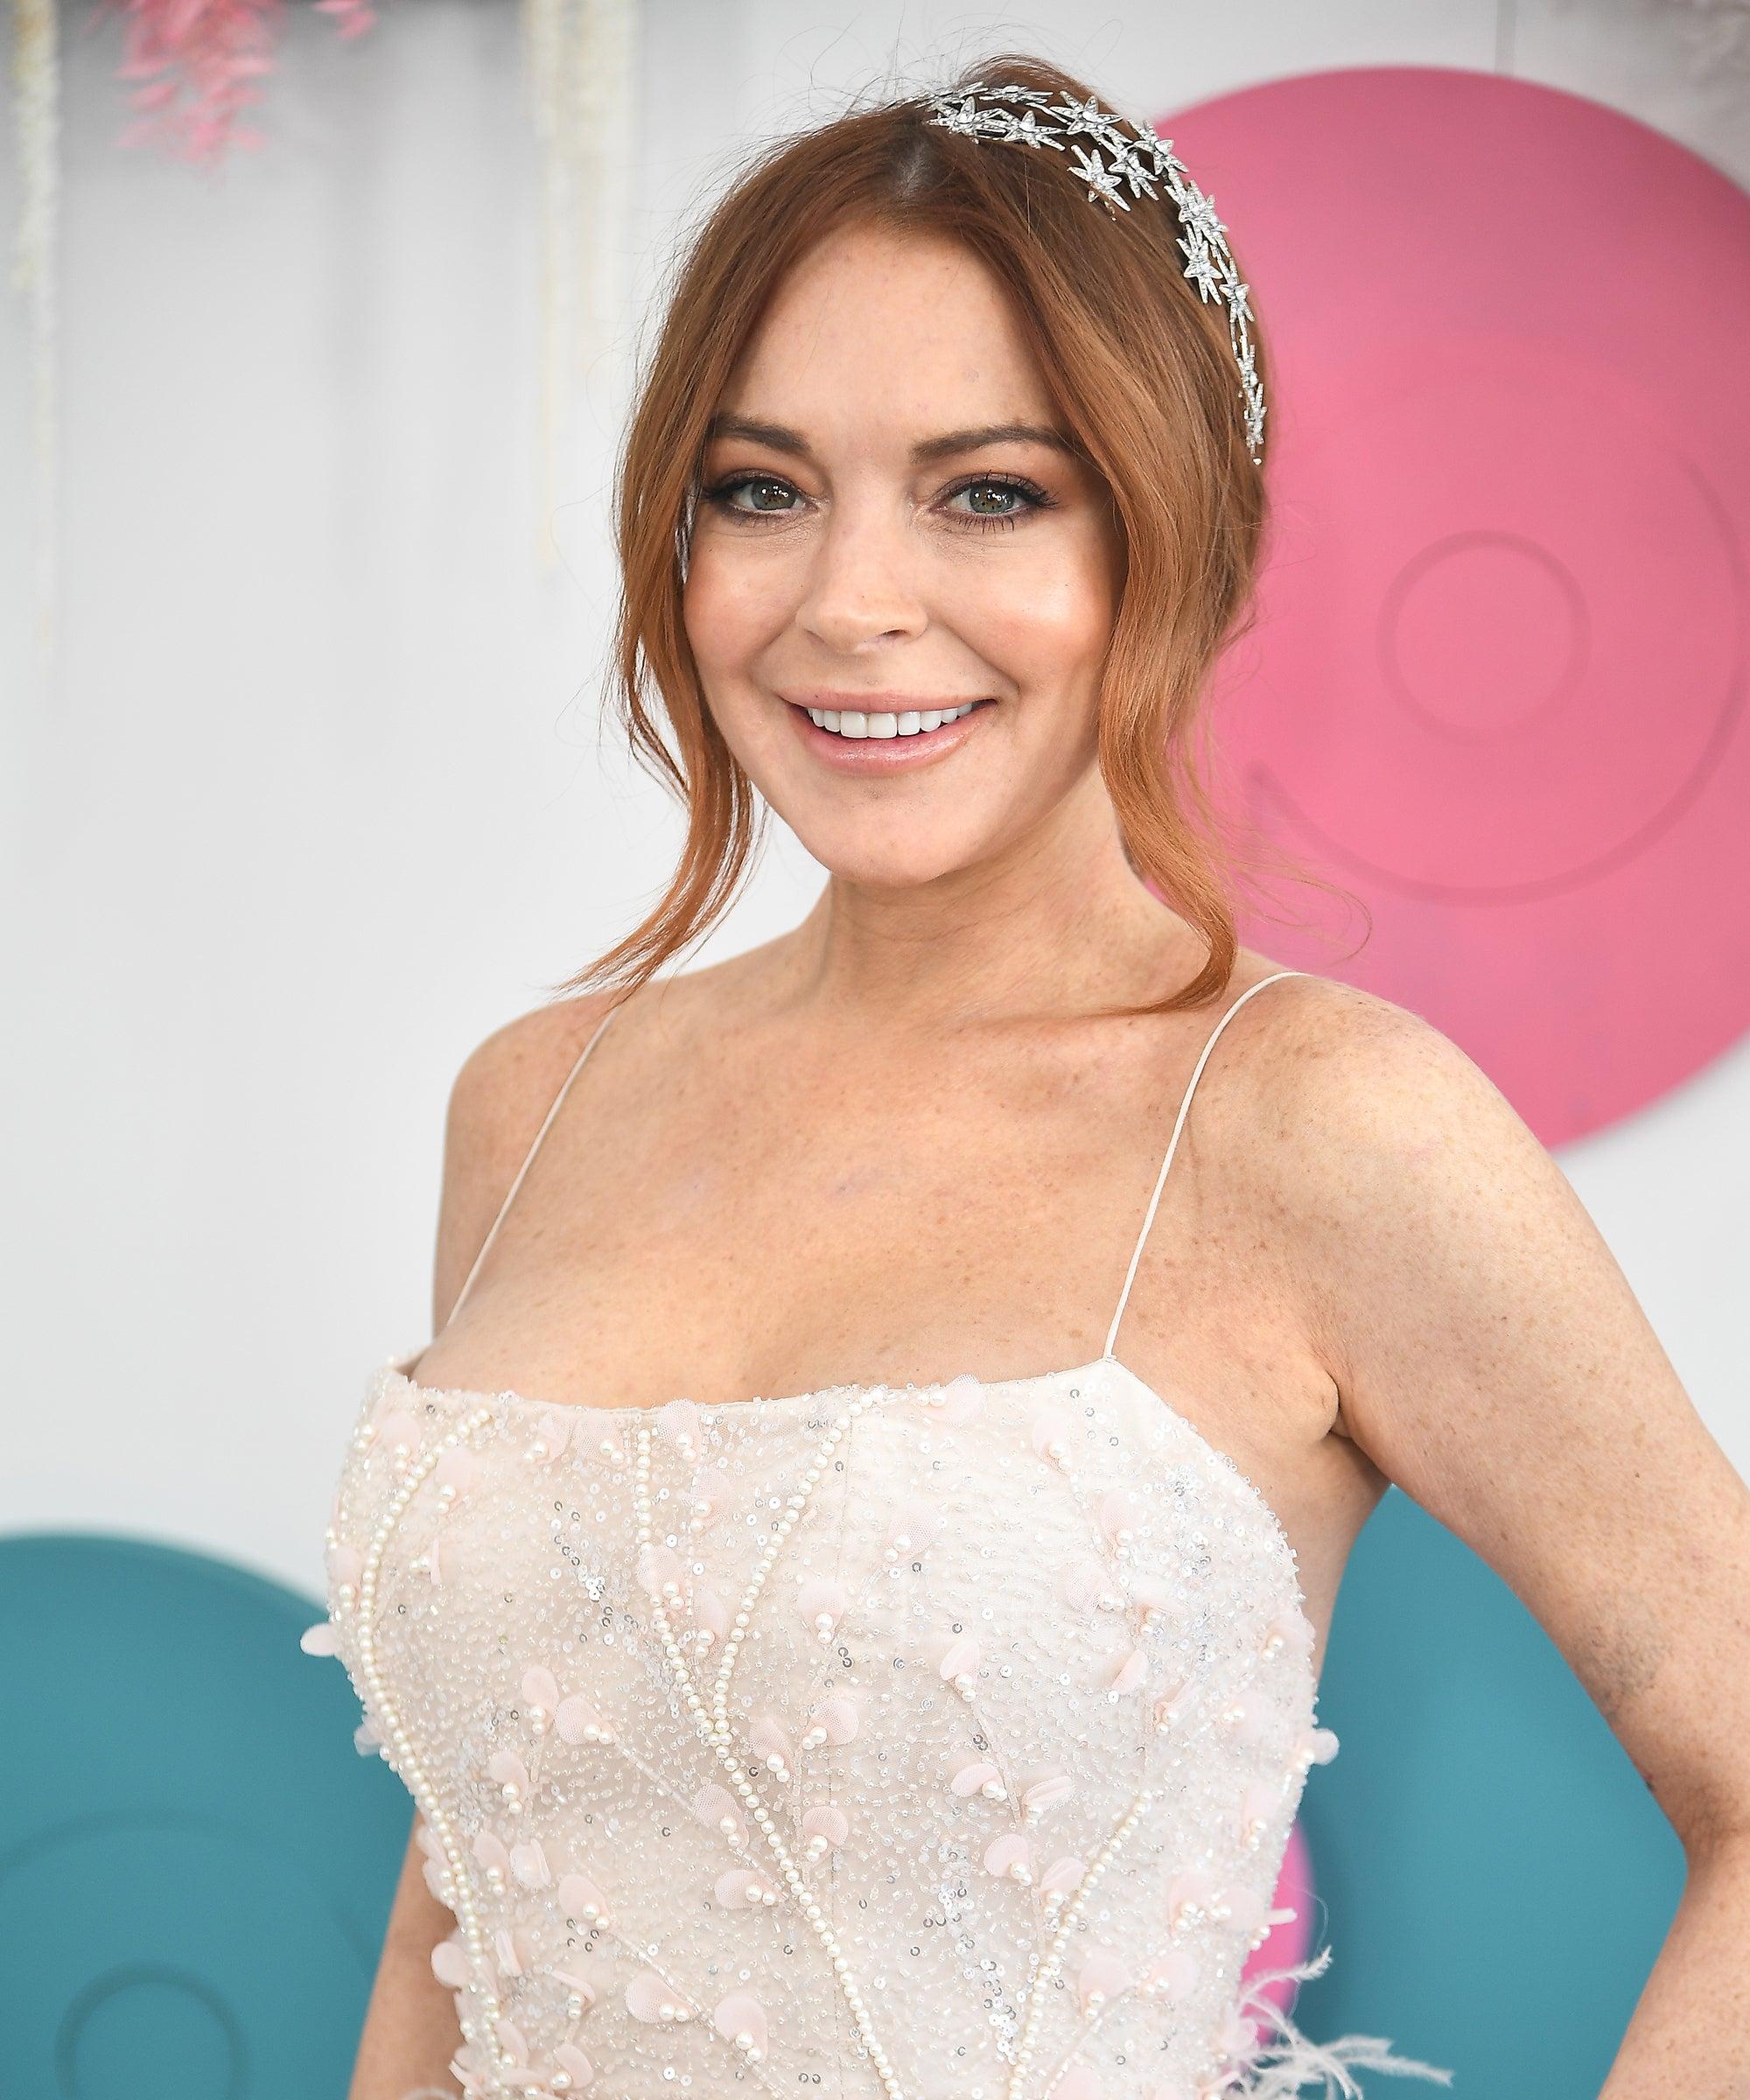 Lindsay Lohan Movies and TV Shows